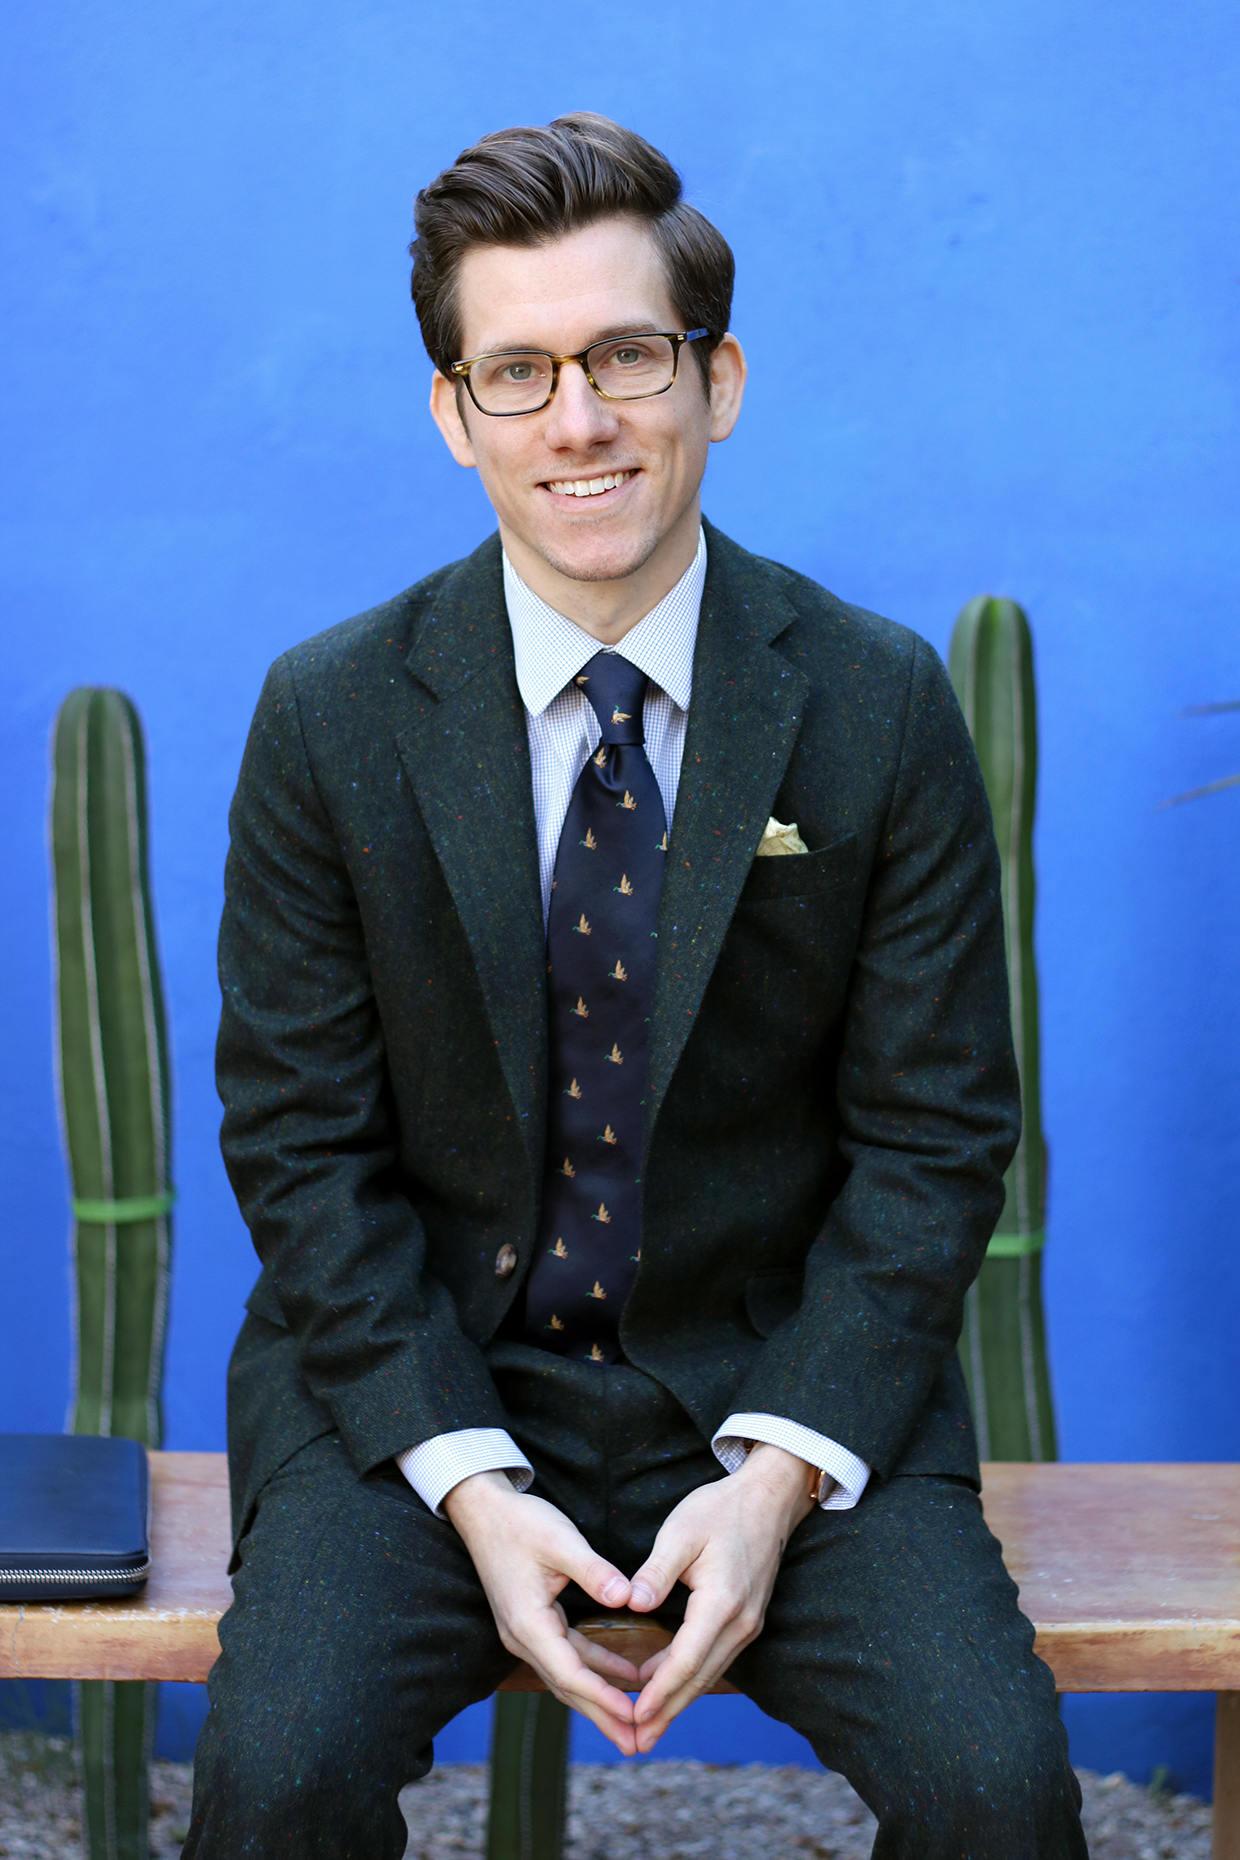 Green suit with navy tie